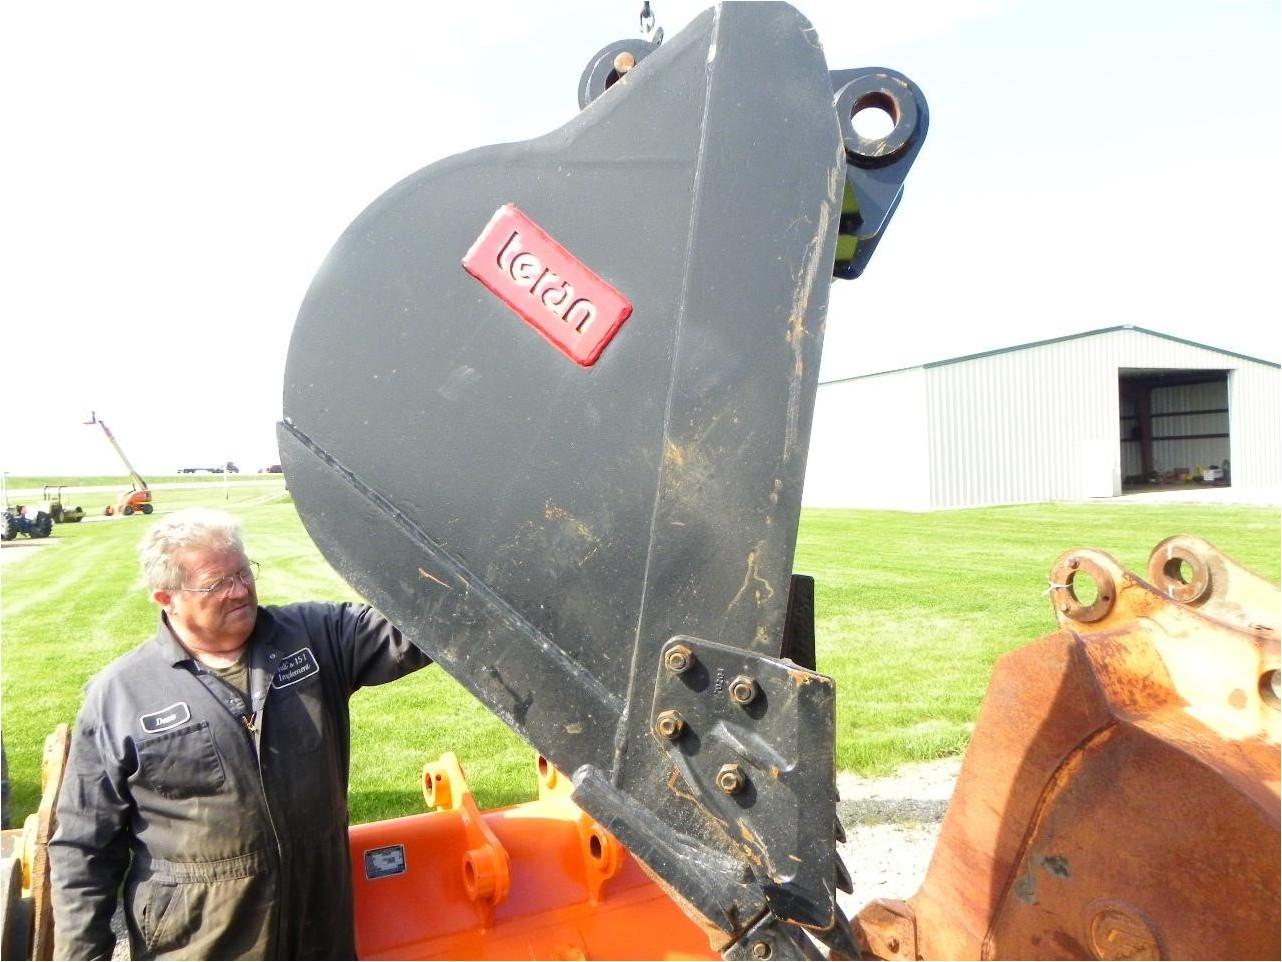 JOHN DEERE 120 Bucket Attachment for sale - Hulls 151 ...